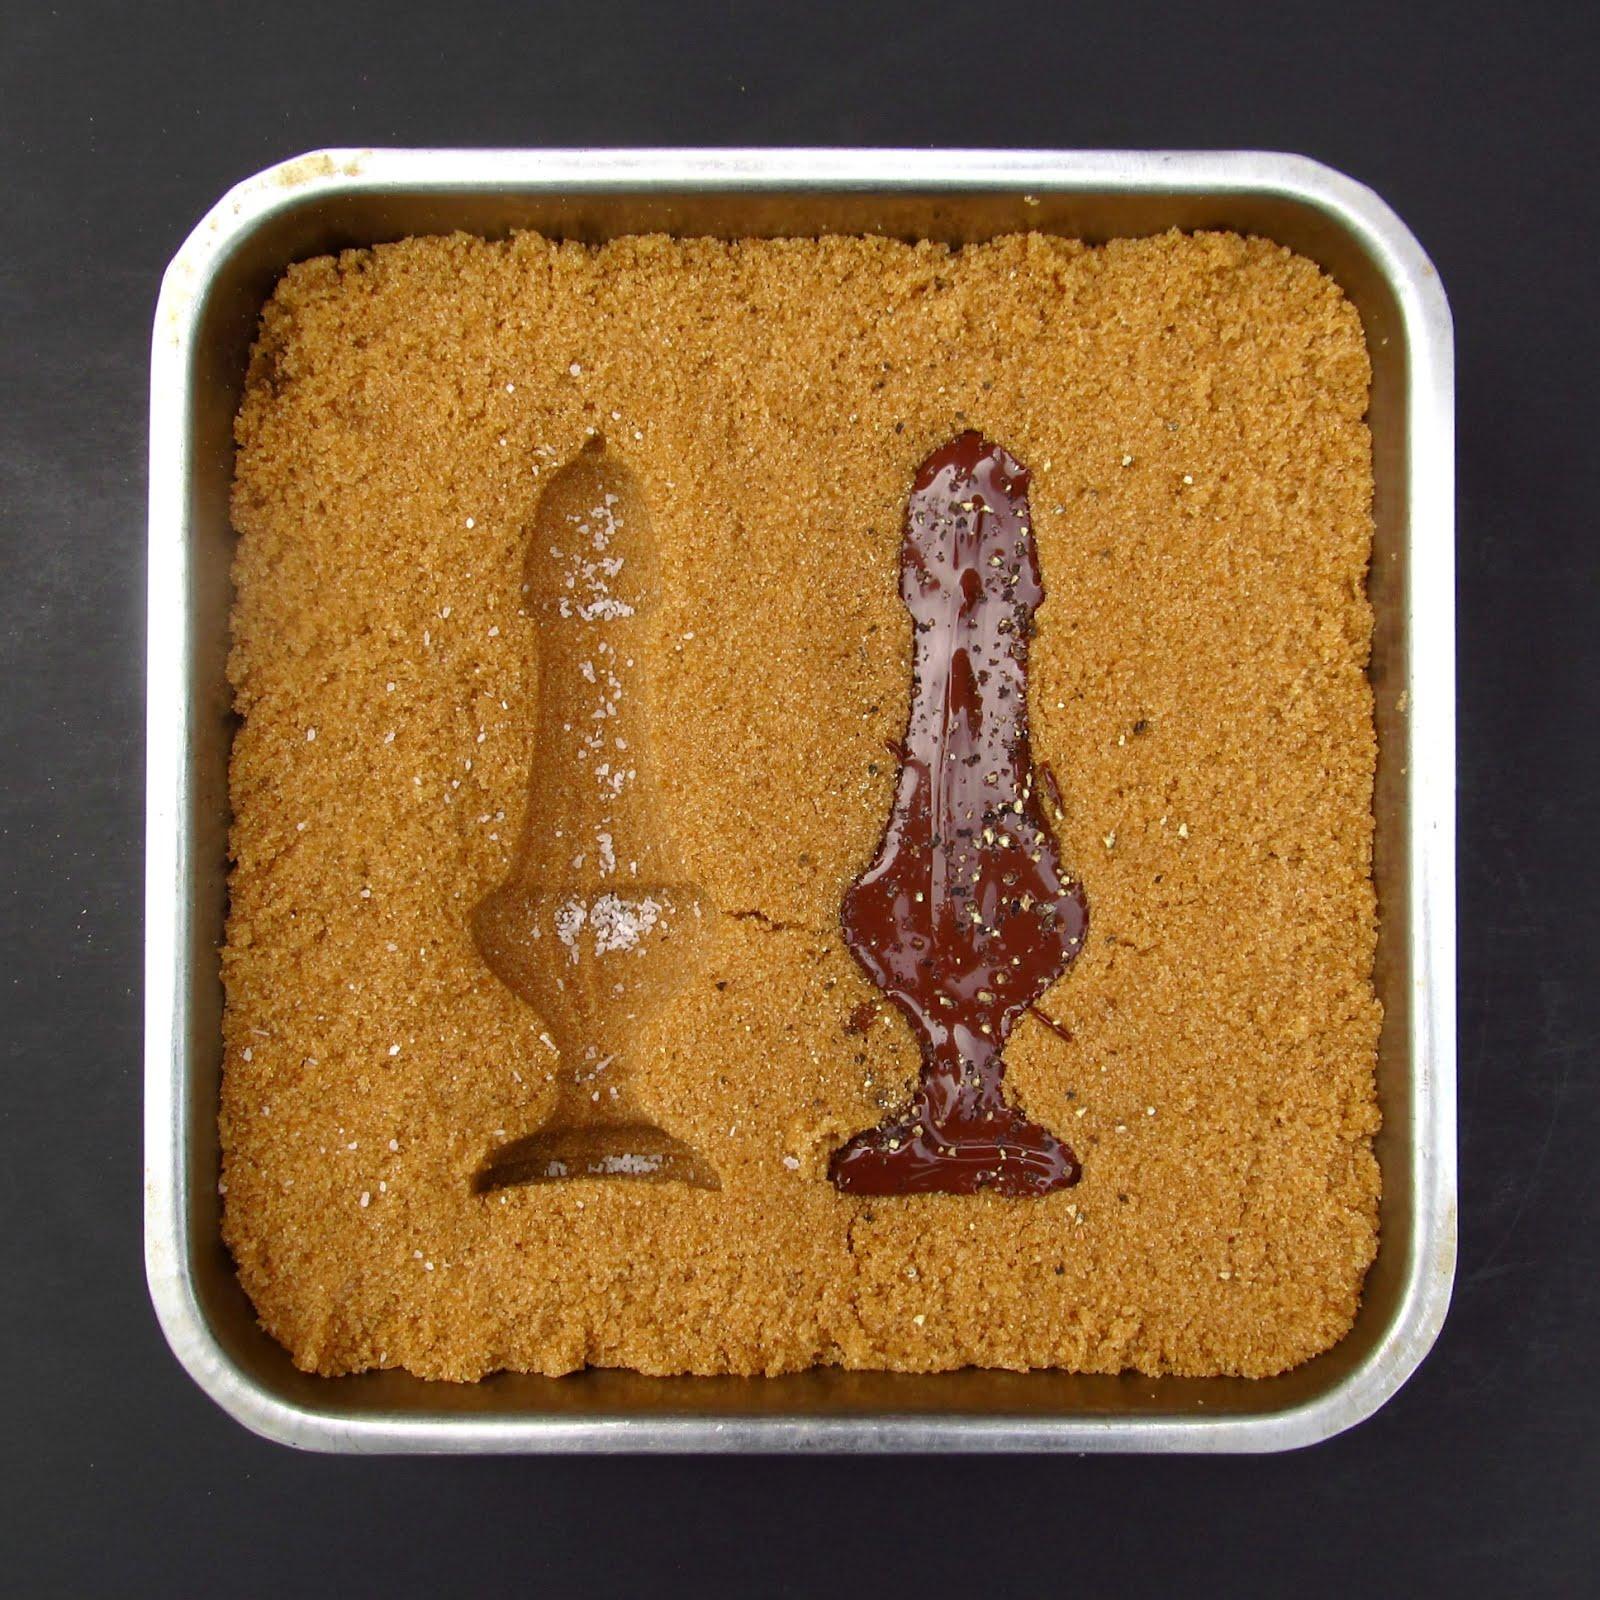 Mold Chocolate Using Brown Sugar